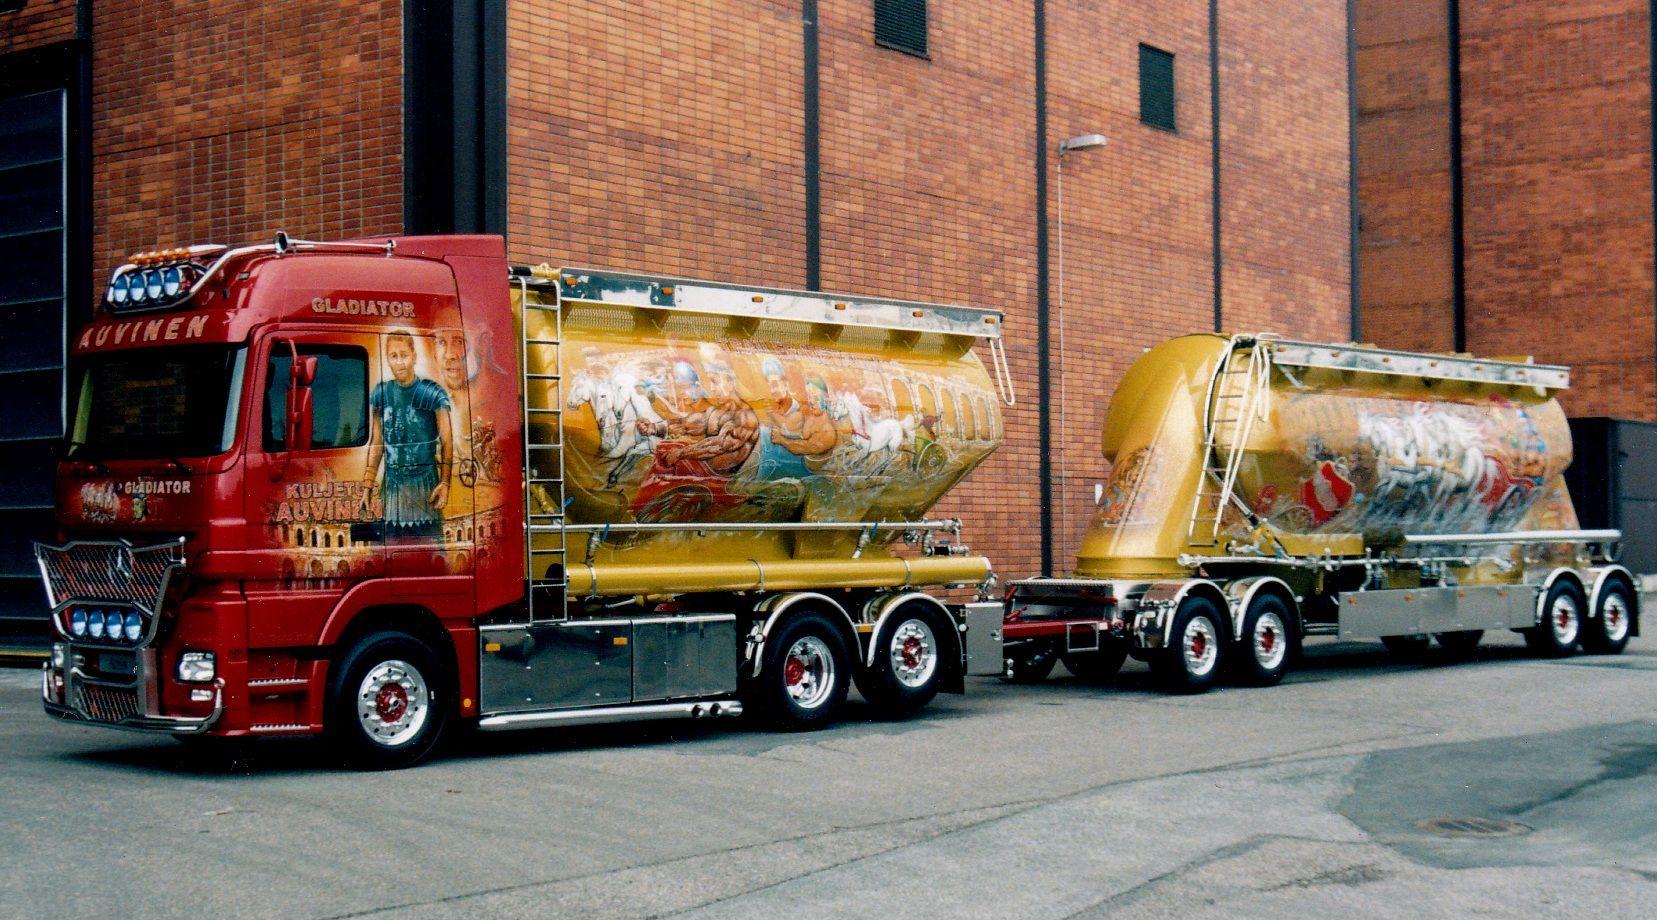 Gladiator I #airbrush #art #artwork #truck #trucking #simoriikonen #airbrushartist #mercedes-benz #mb #gladiator